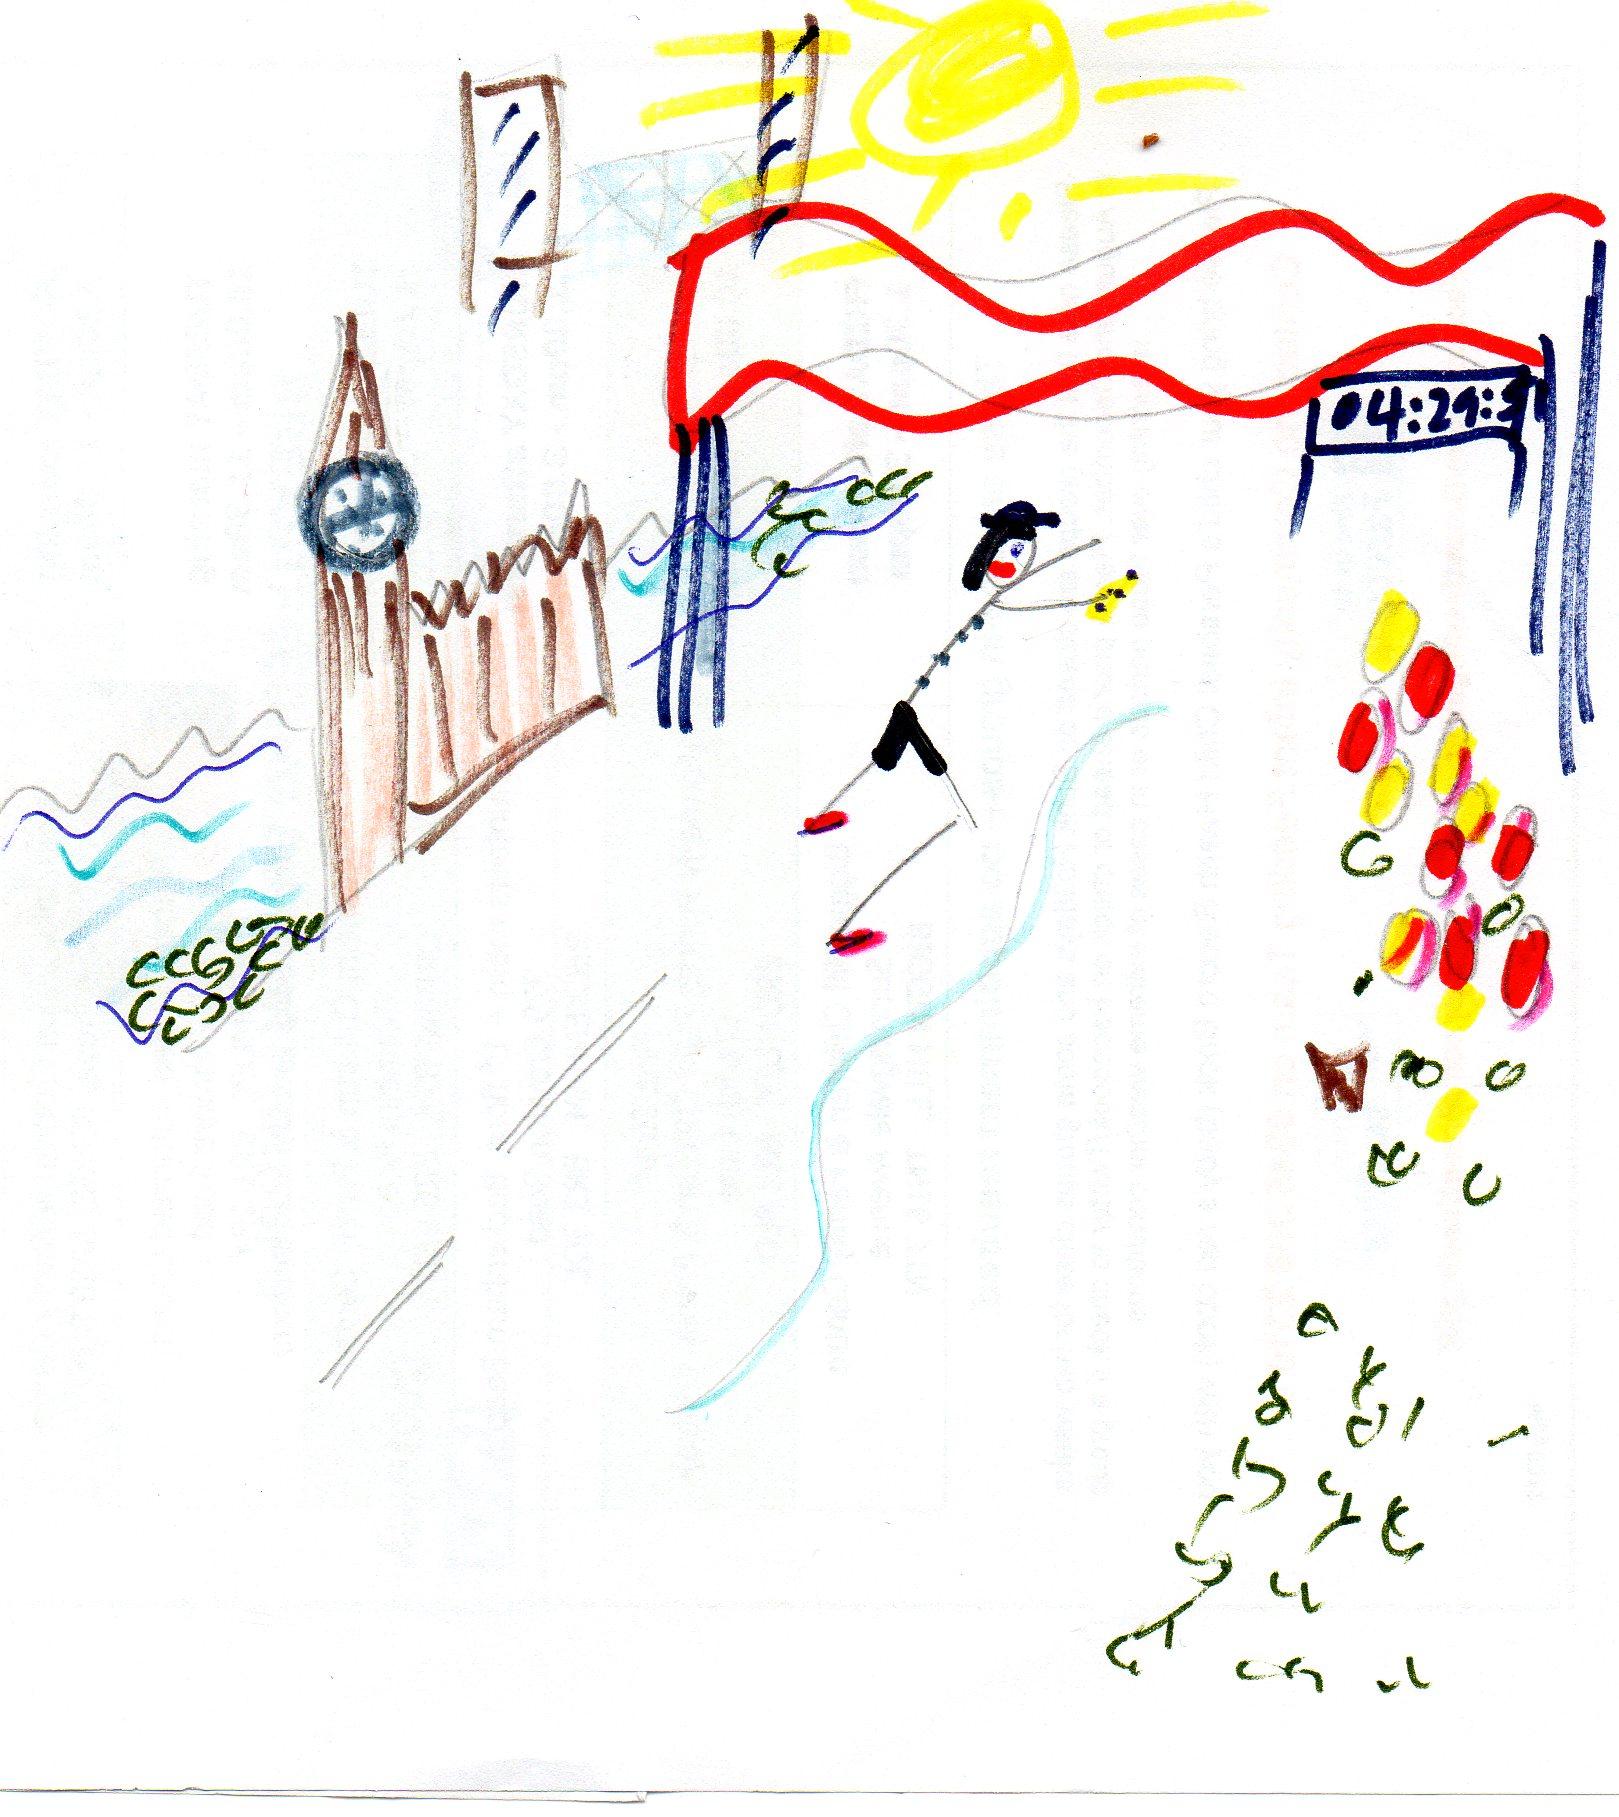 Finish line at the Virgin London marathon